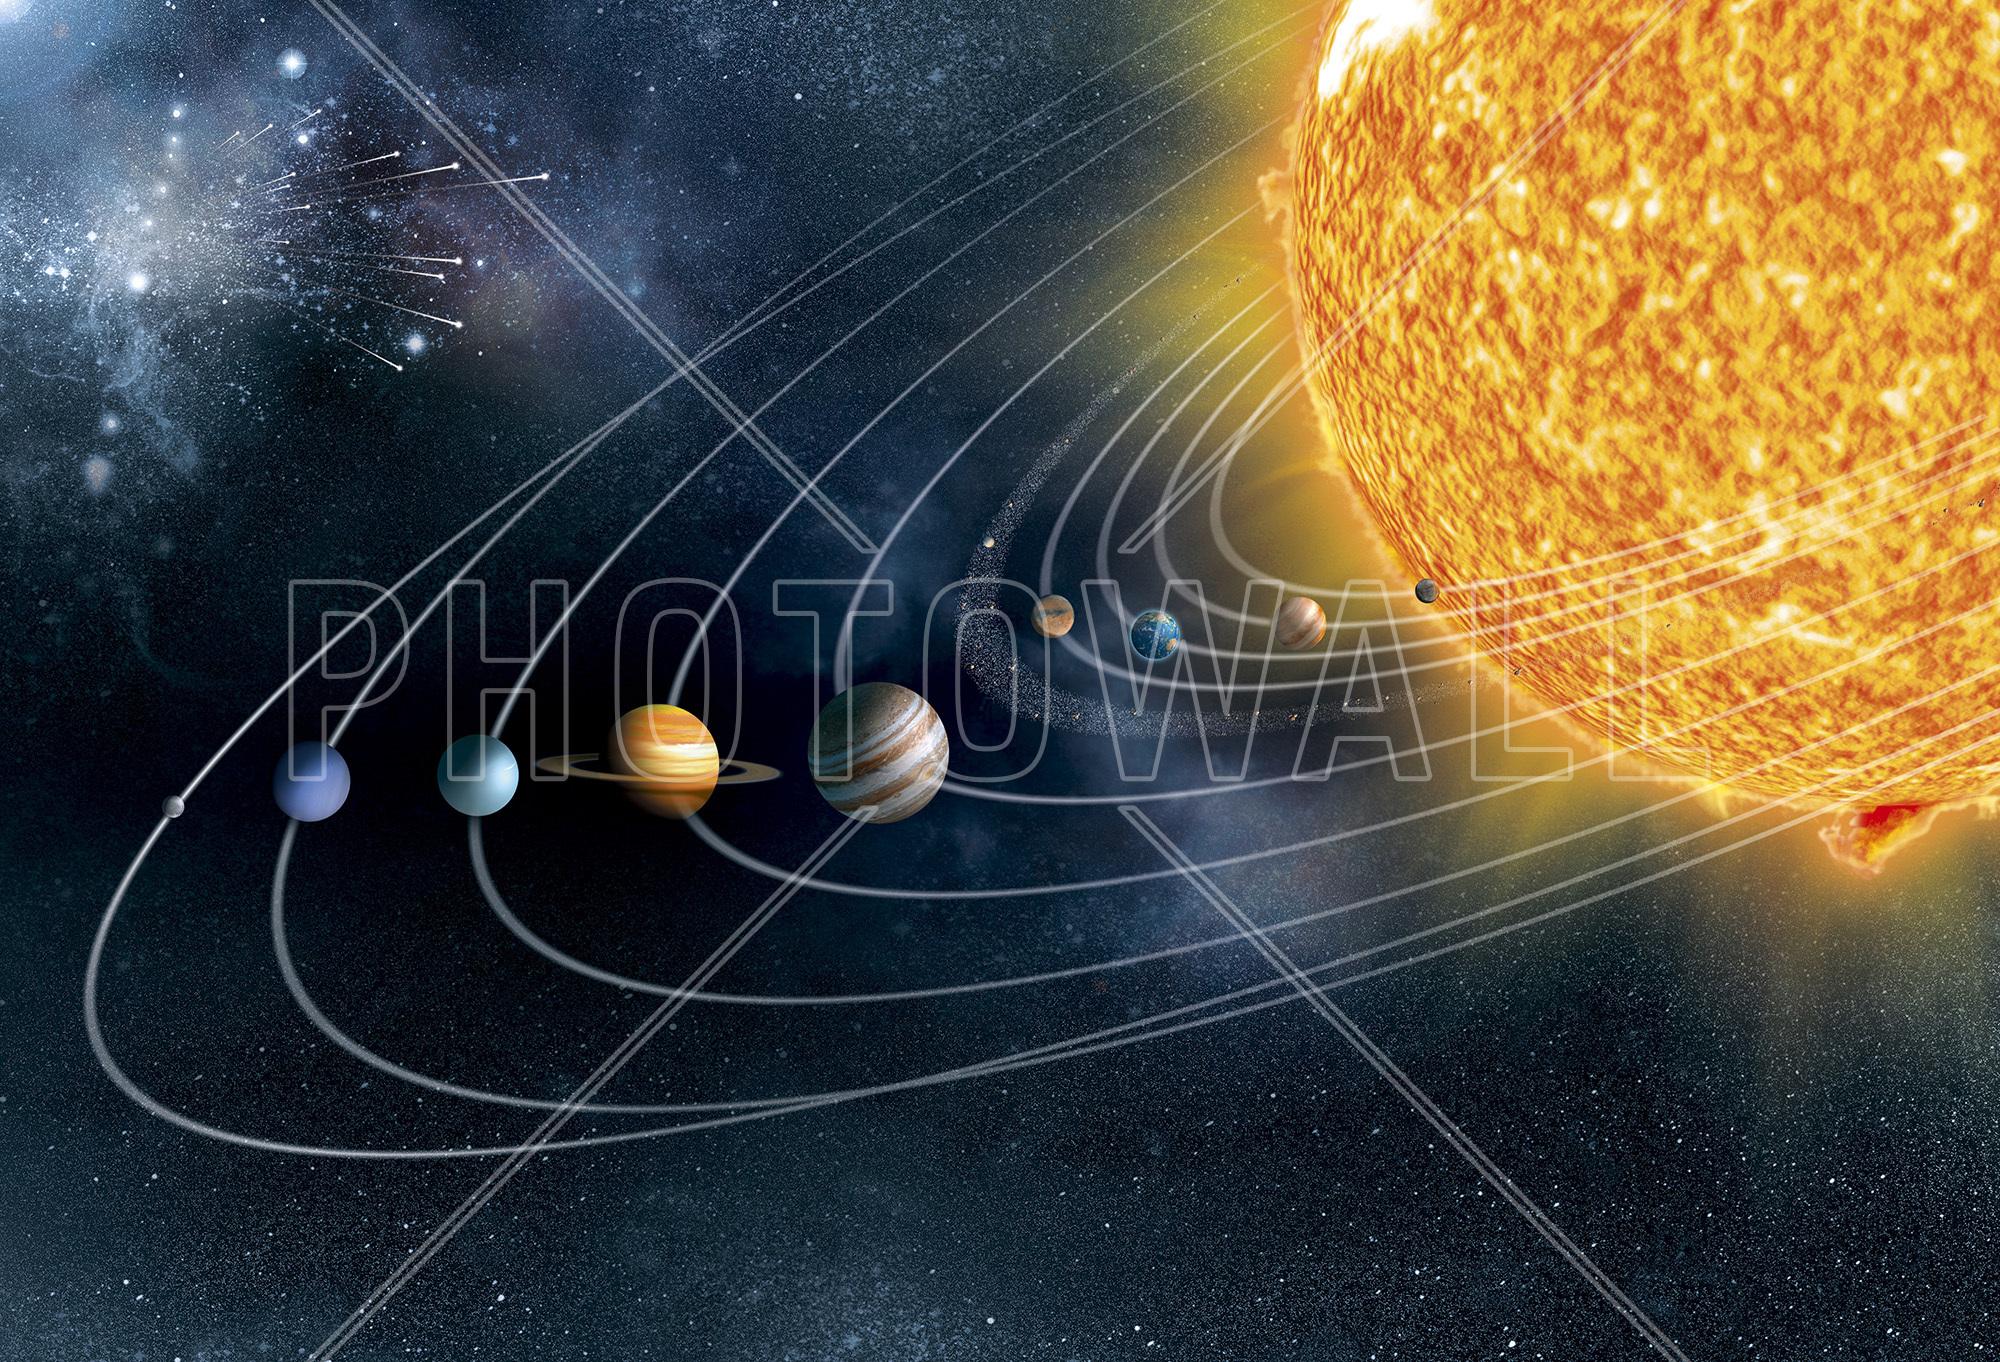 Ecliptic Solar System